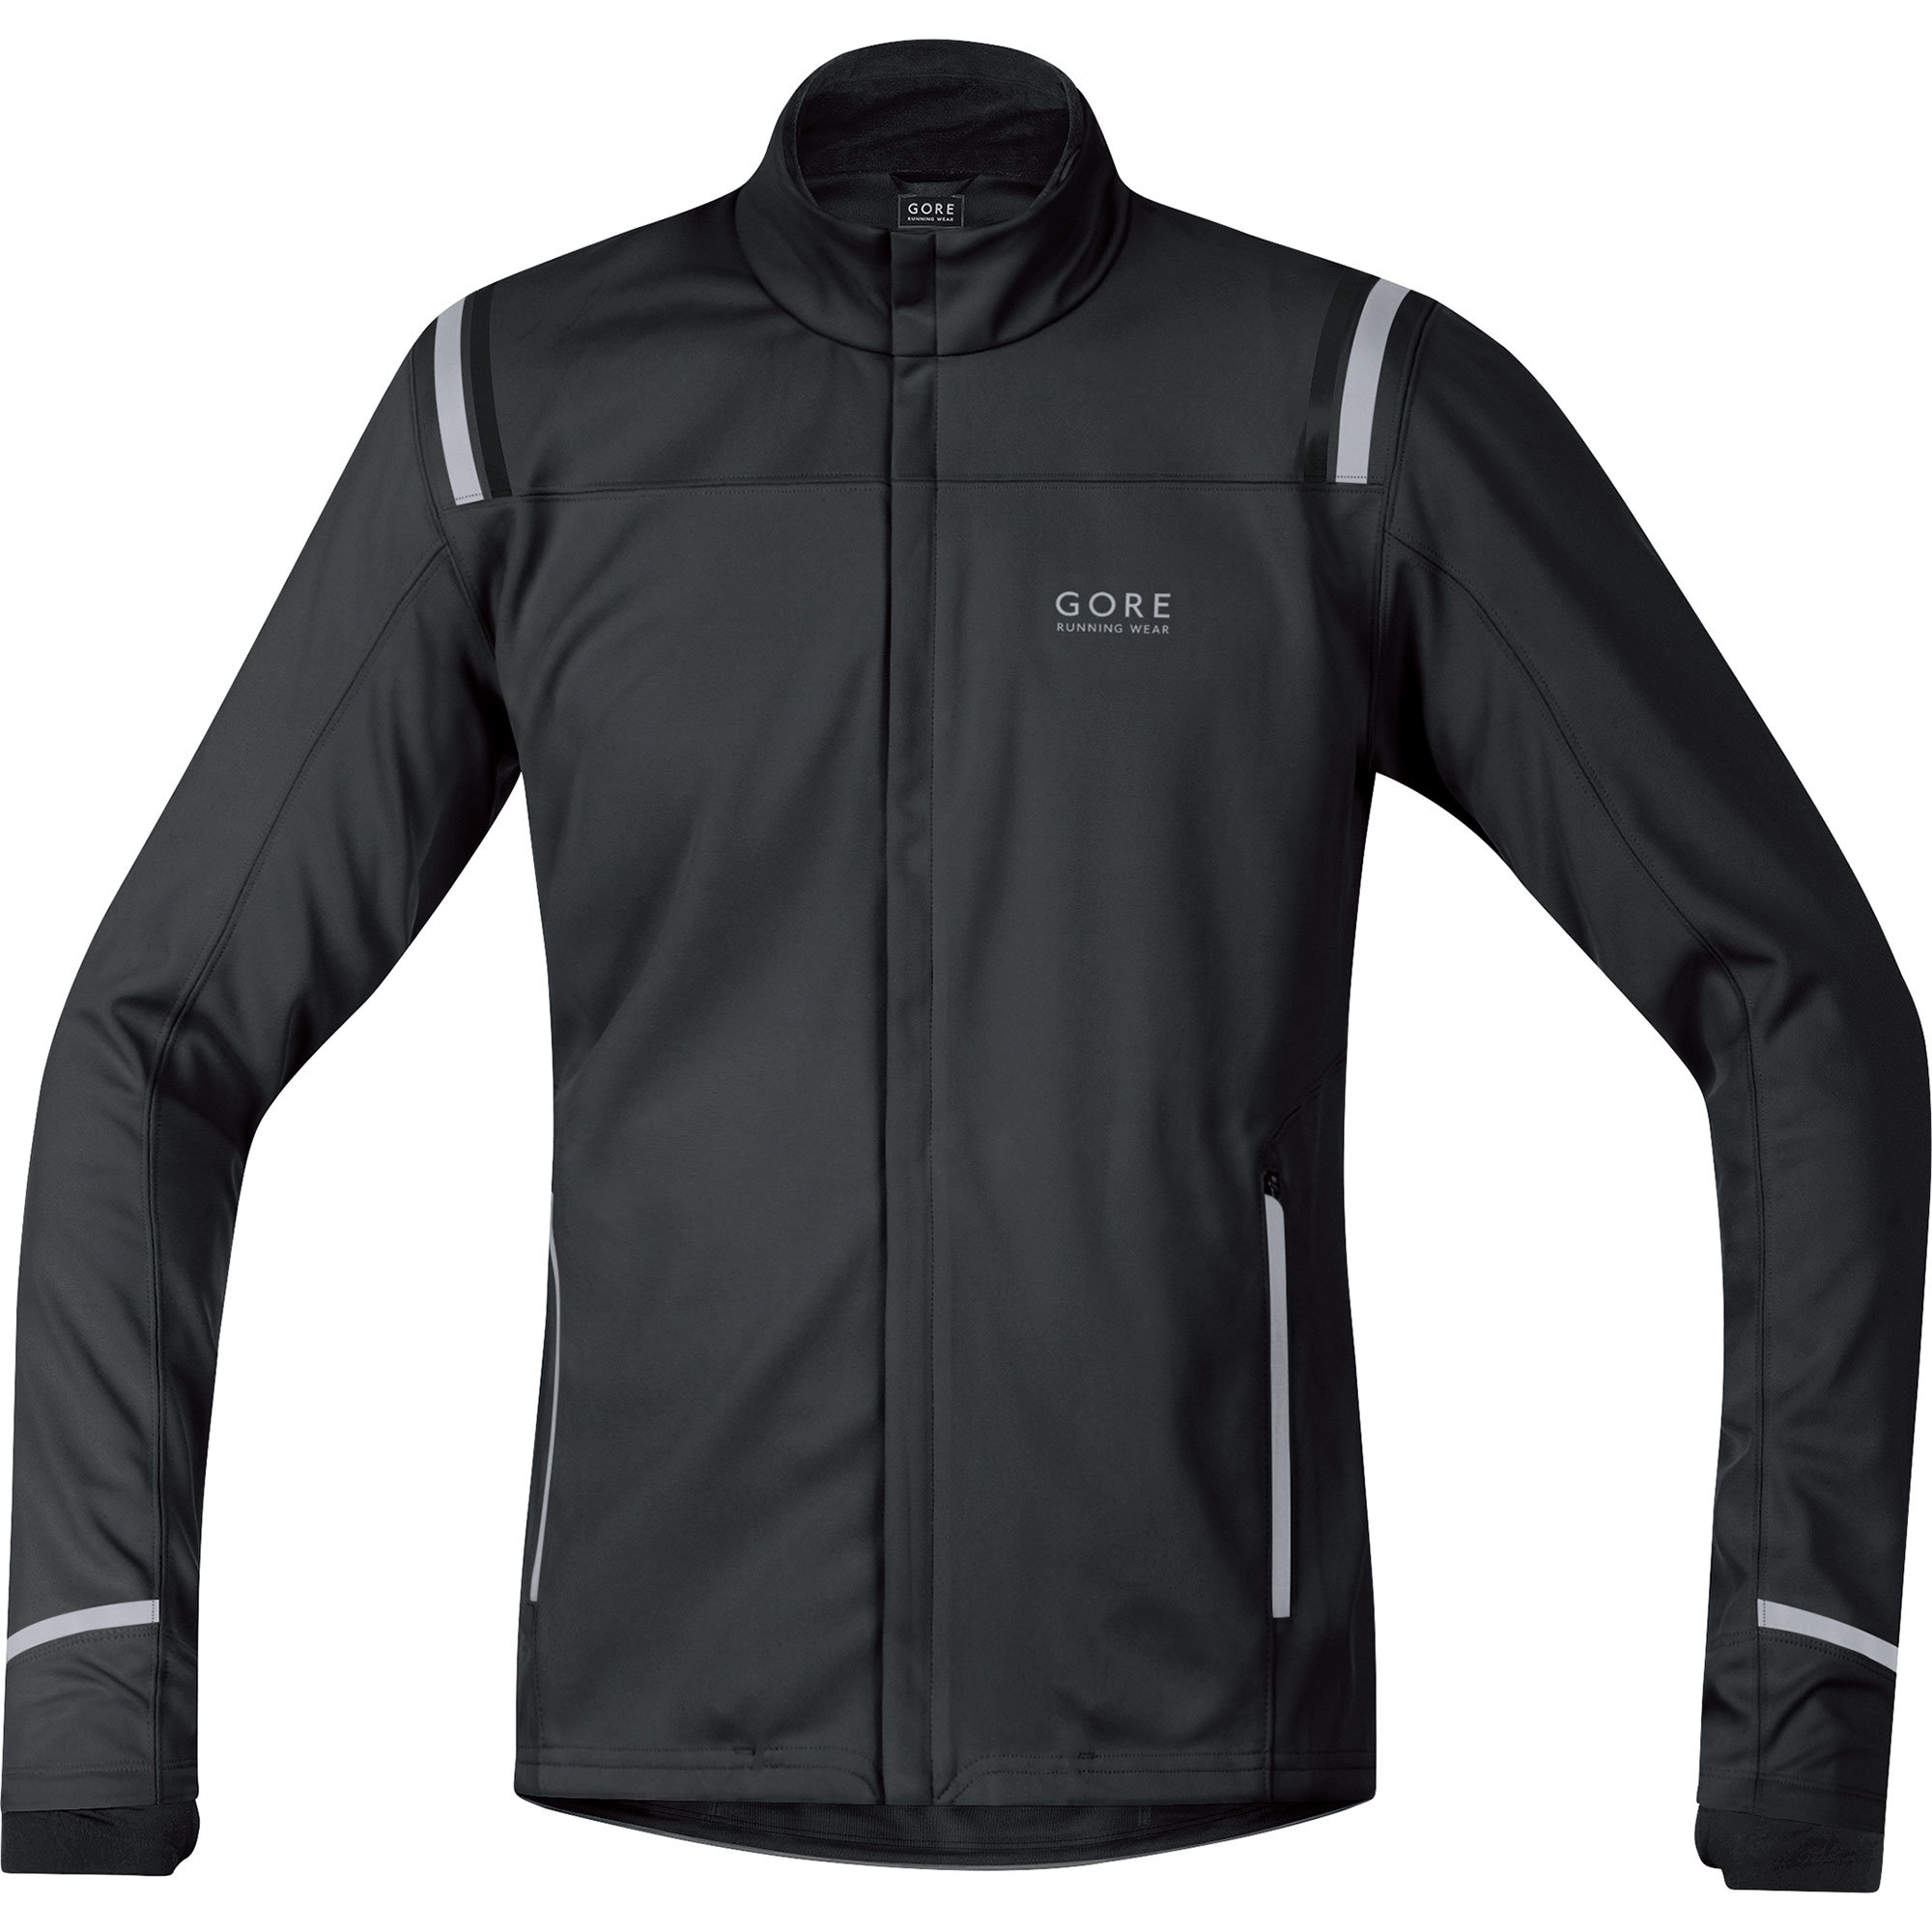 Gore Mythos 2.0 WS SO Jacket in Schwarz